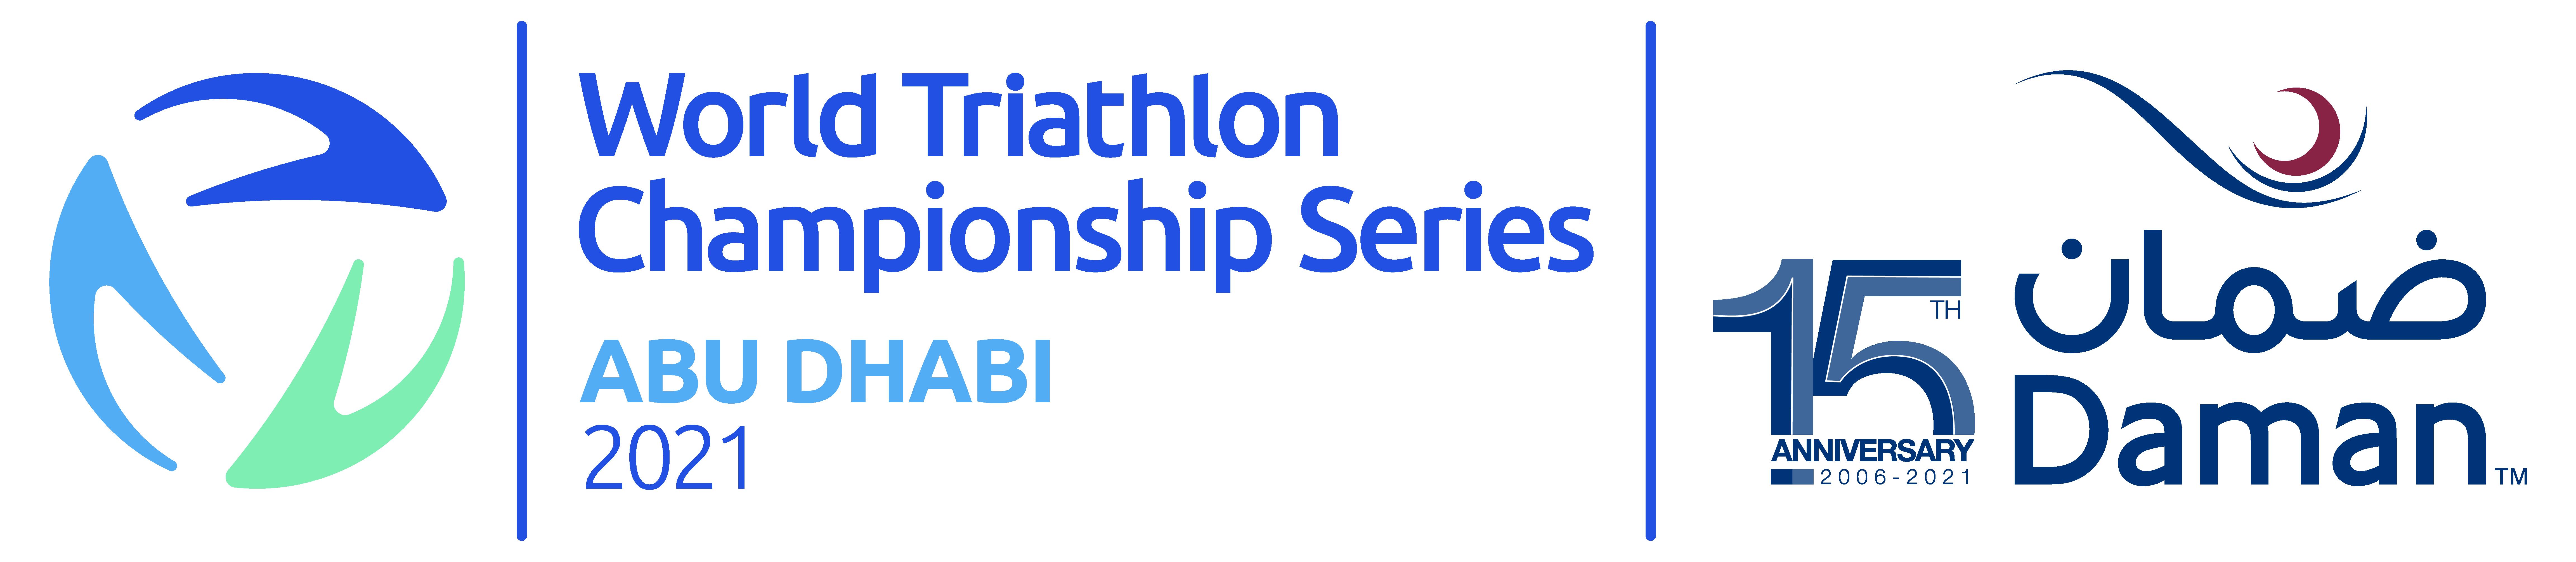 2021 World Triathlon Championship Series Abu Dhabi logo